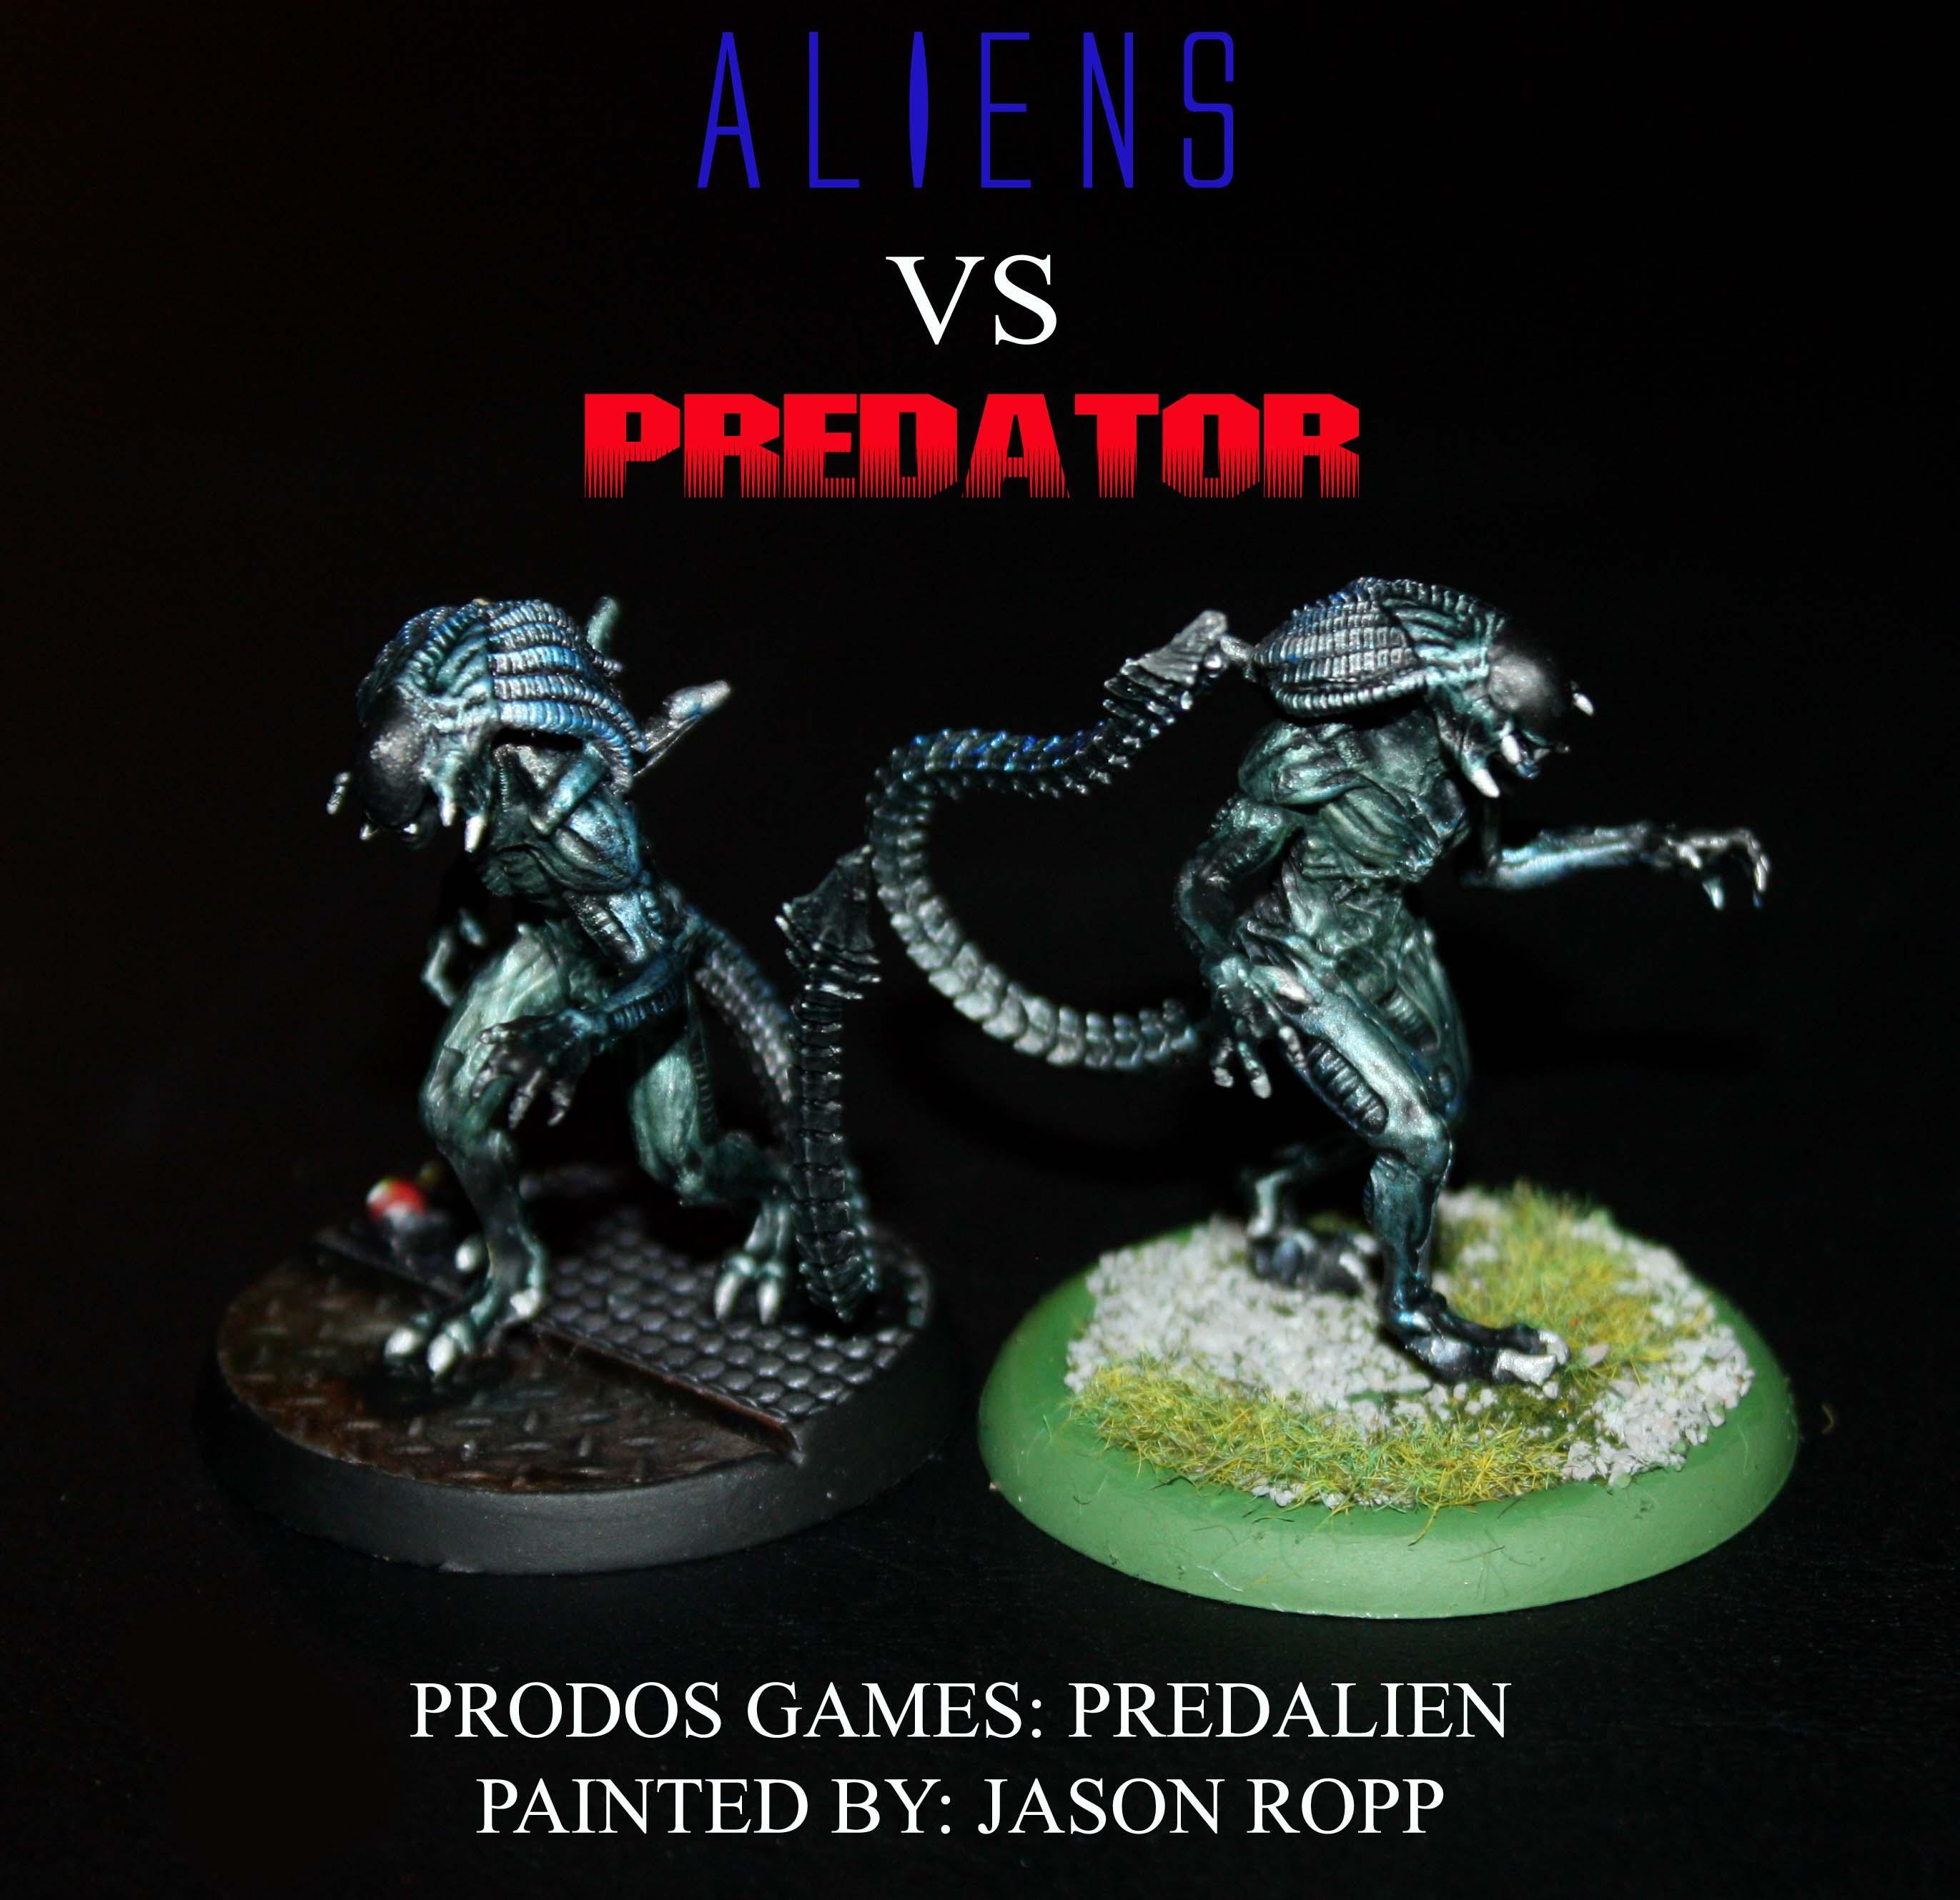 Alien, Aliens, Avp, Pred, Predalien, Predator, Prodos Games, Terminator Armor, Wargamer, Water Horse Games